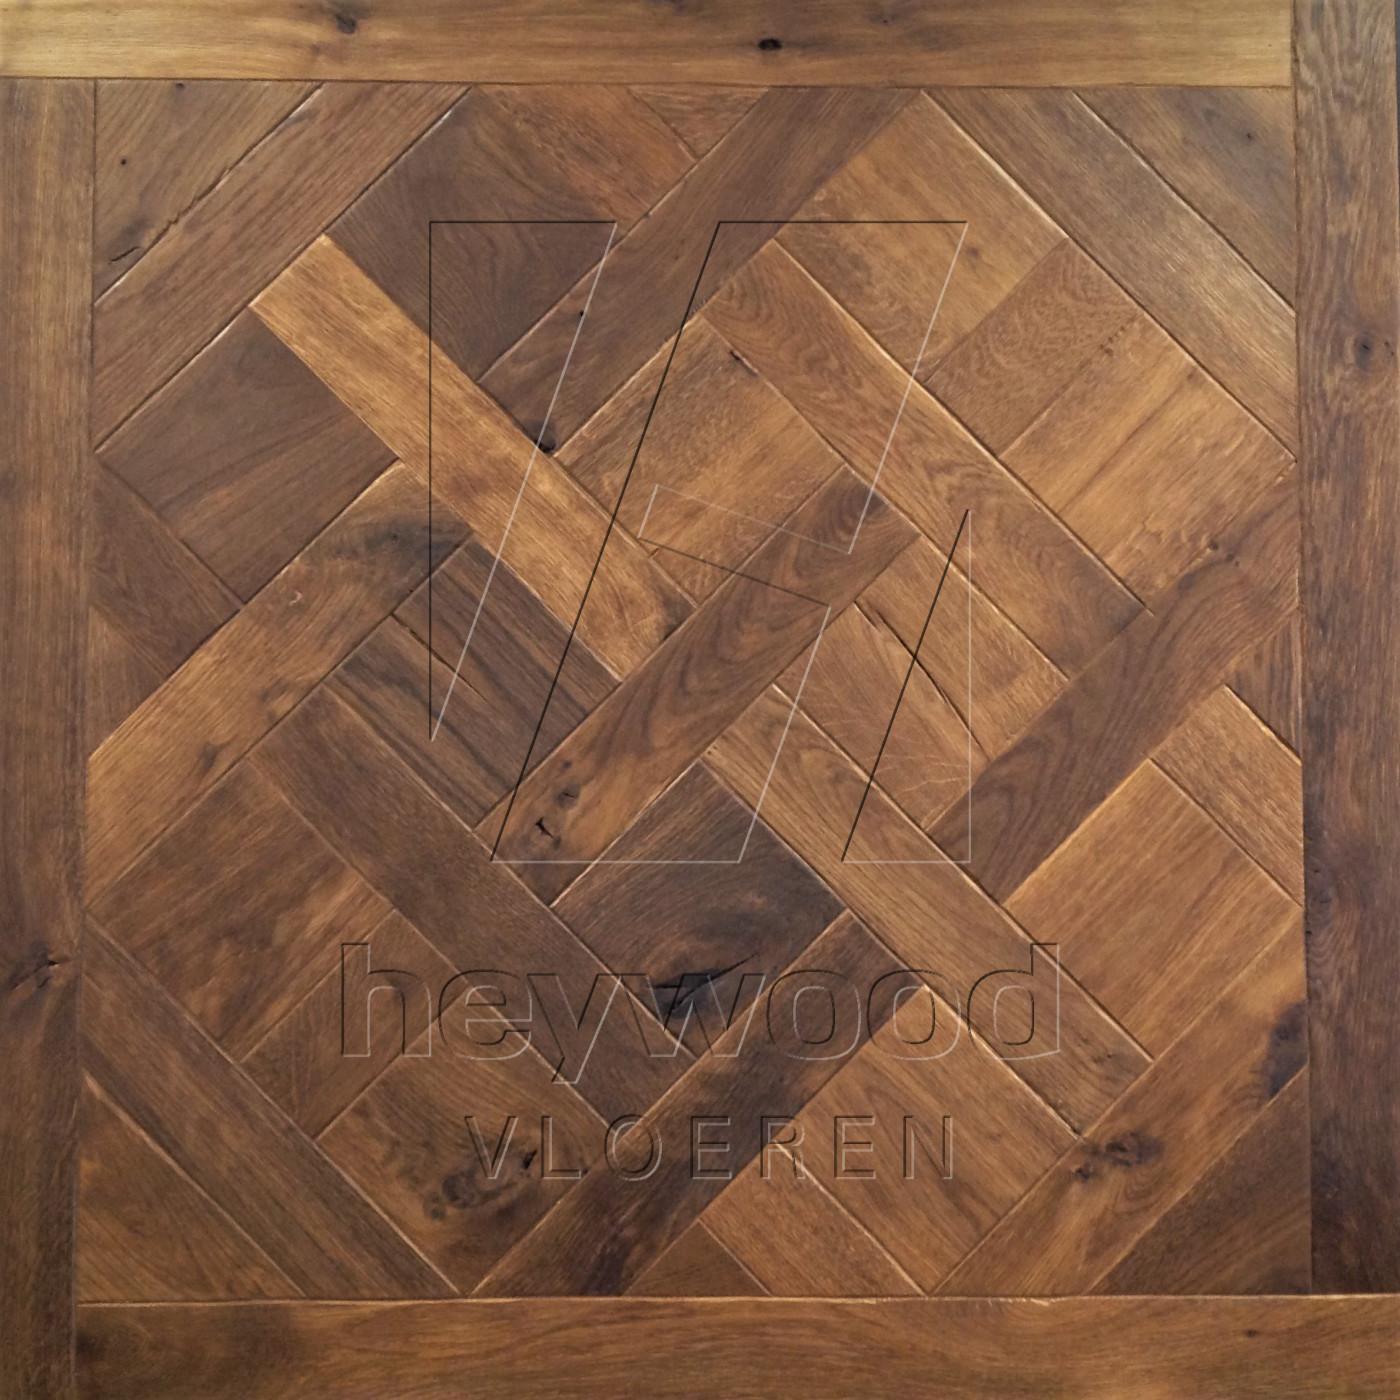 Antique Versailles 'Kilimanjaro' in Floor Panels & 3D Wall Panels of Pattern & Panel Floors